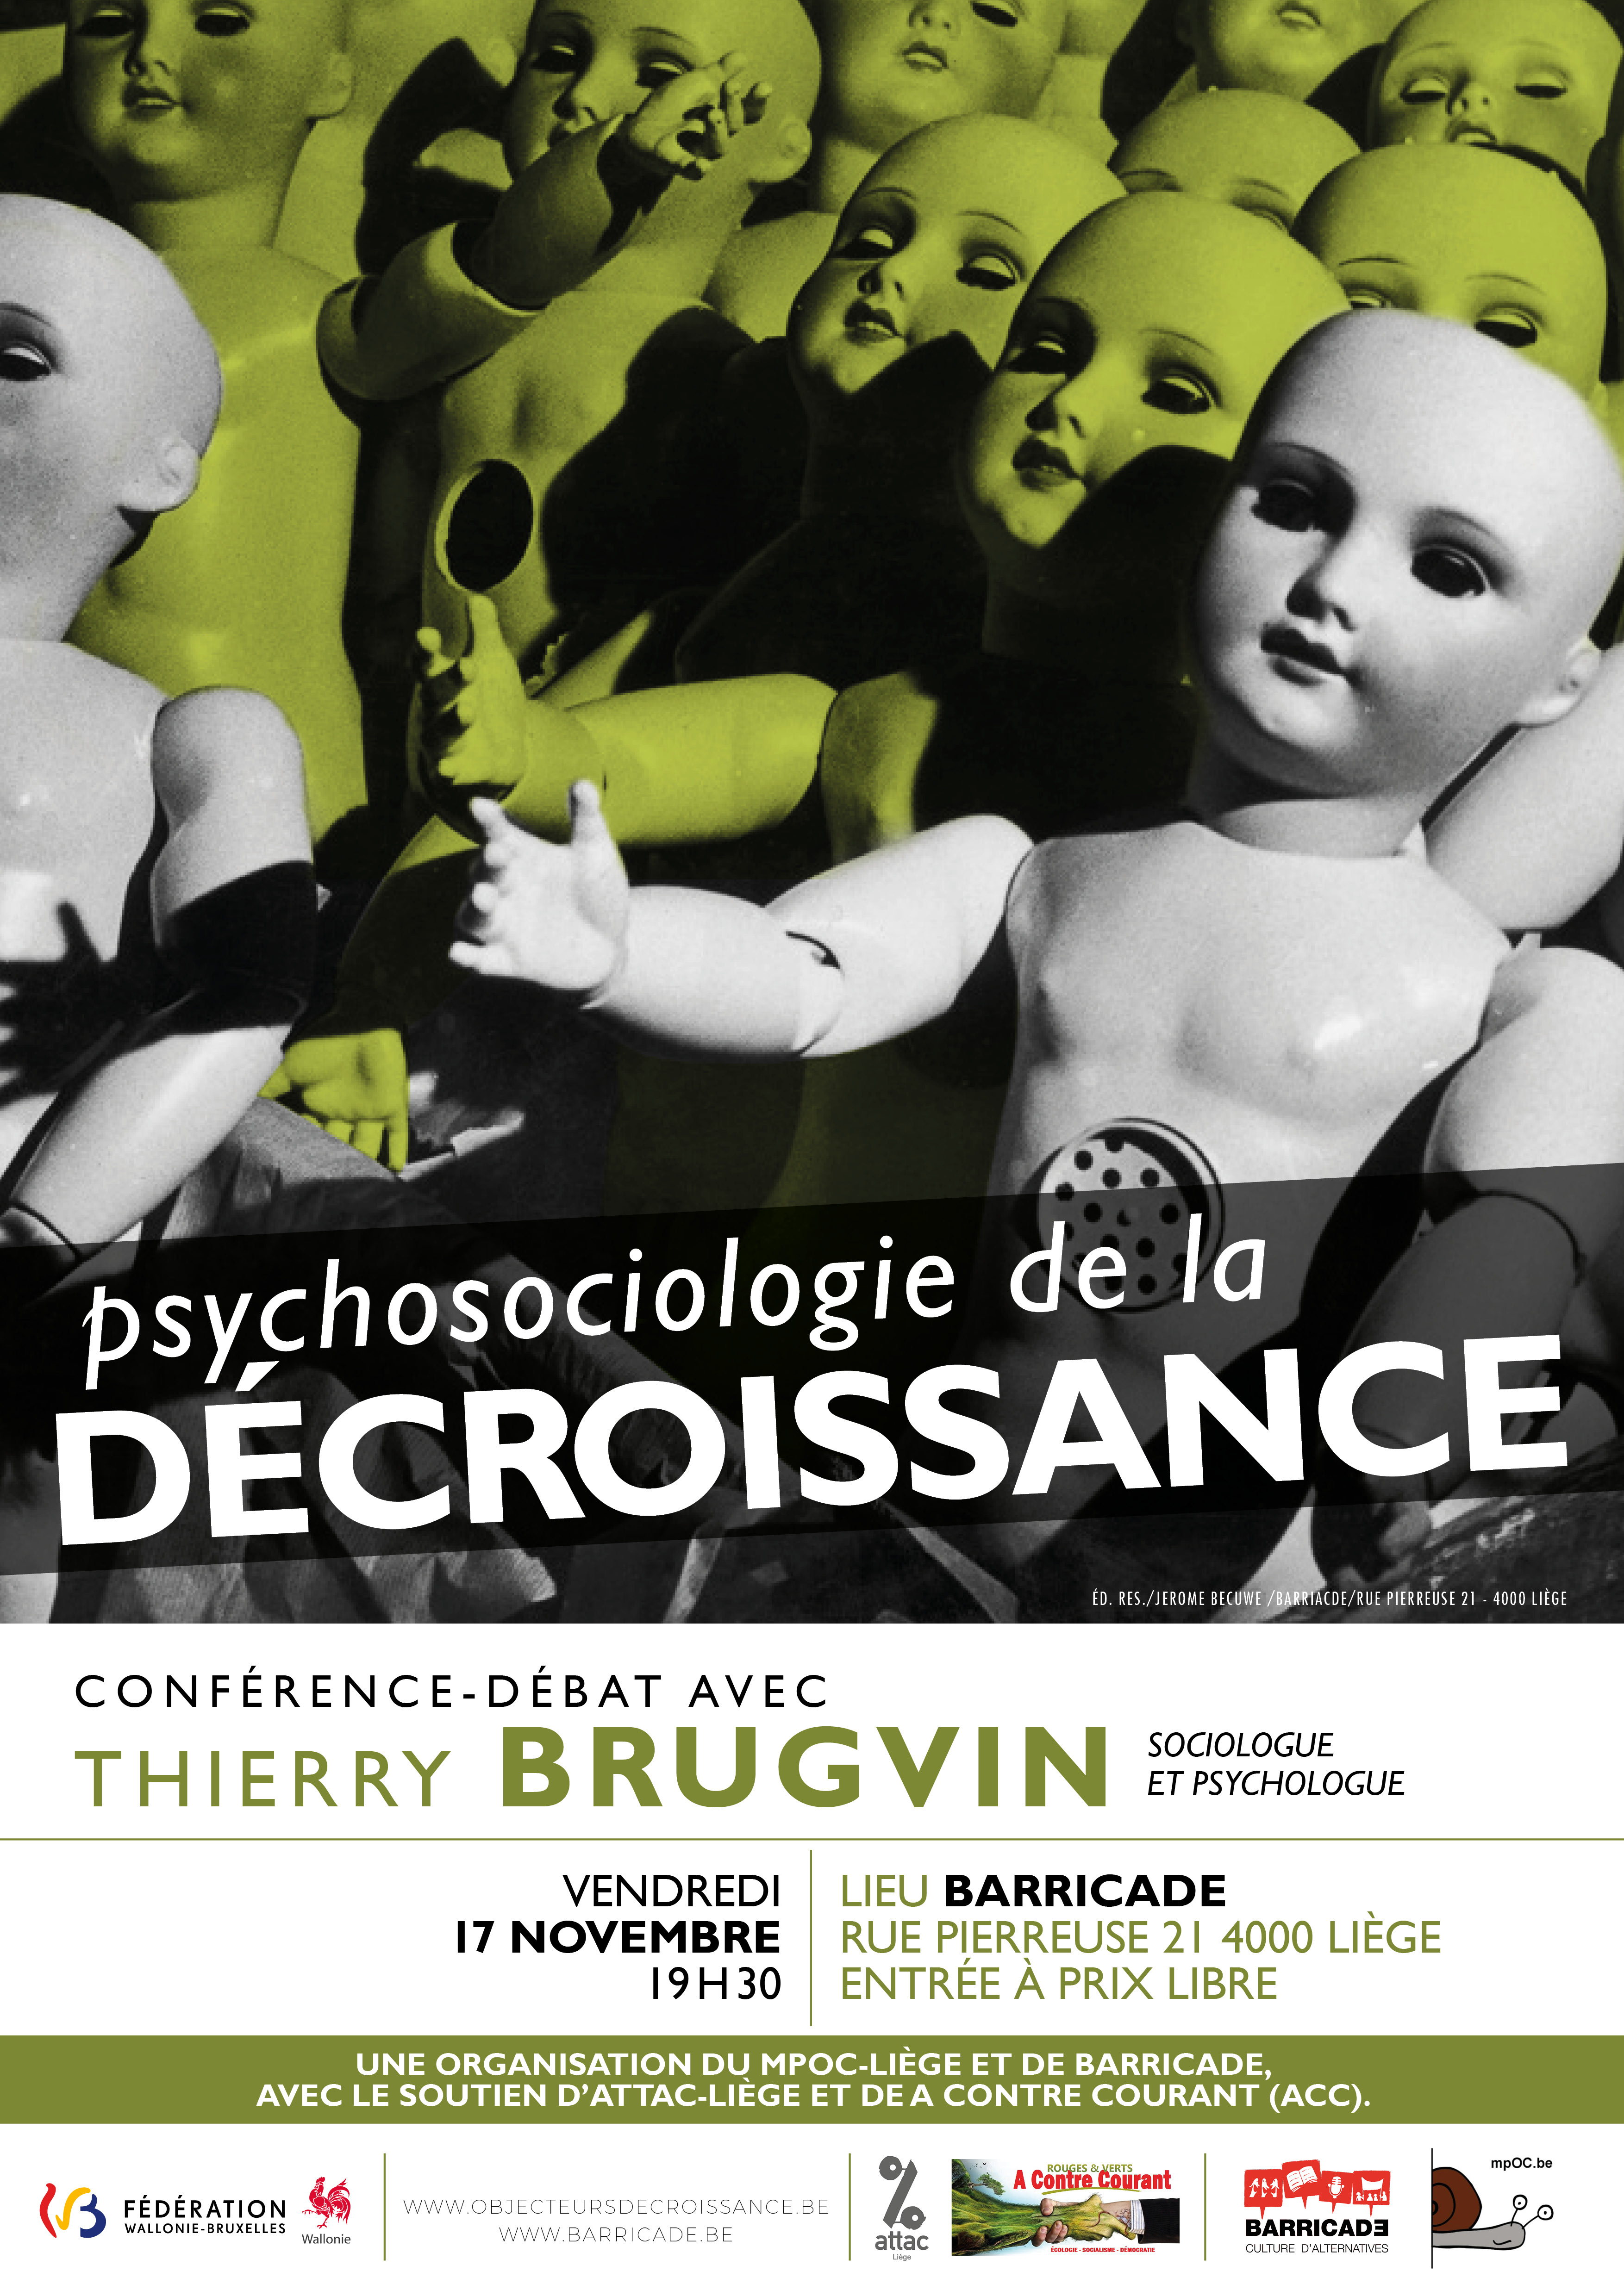 Psychosociologie de la decroissance_conference_HD